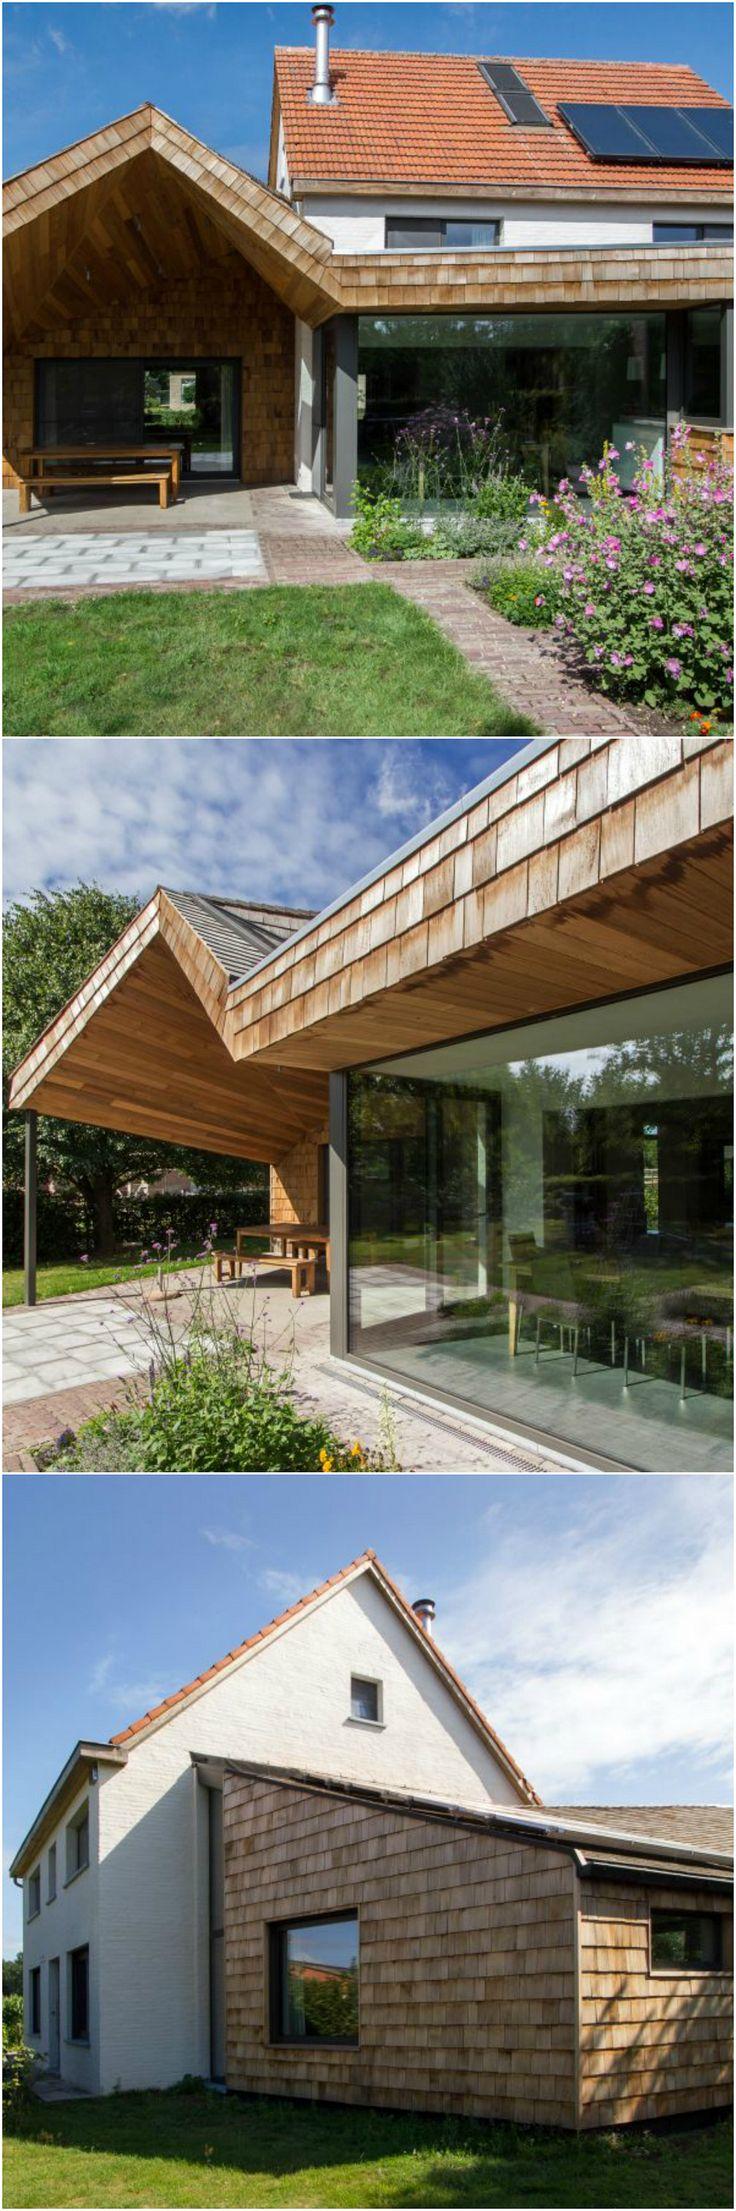 Meer dan 1000 idee n over grote ramen op pinterest ramen blootgestelde plafonds en slaapkamer - Uitbreiding oud huis ...